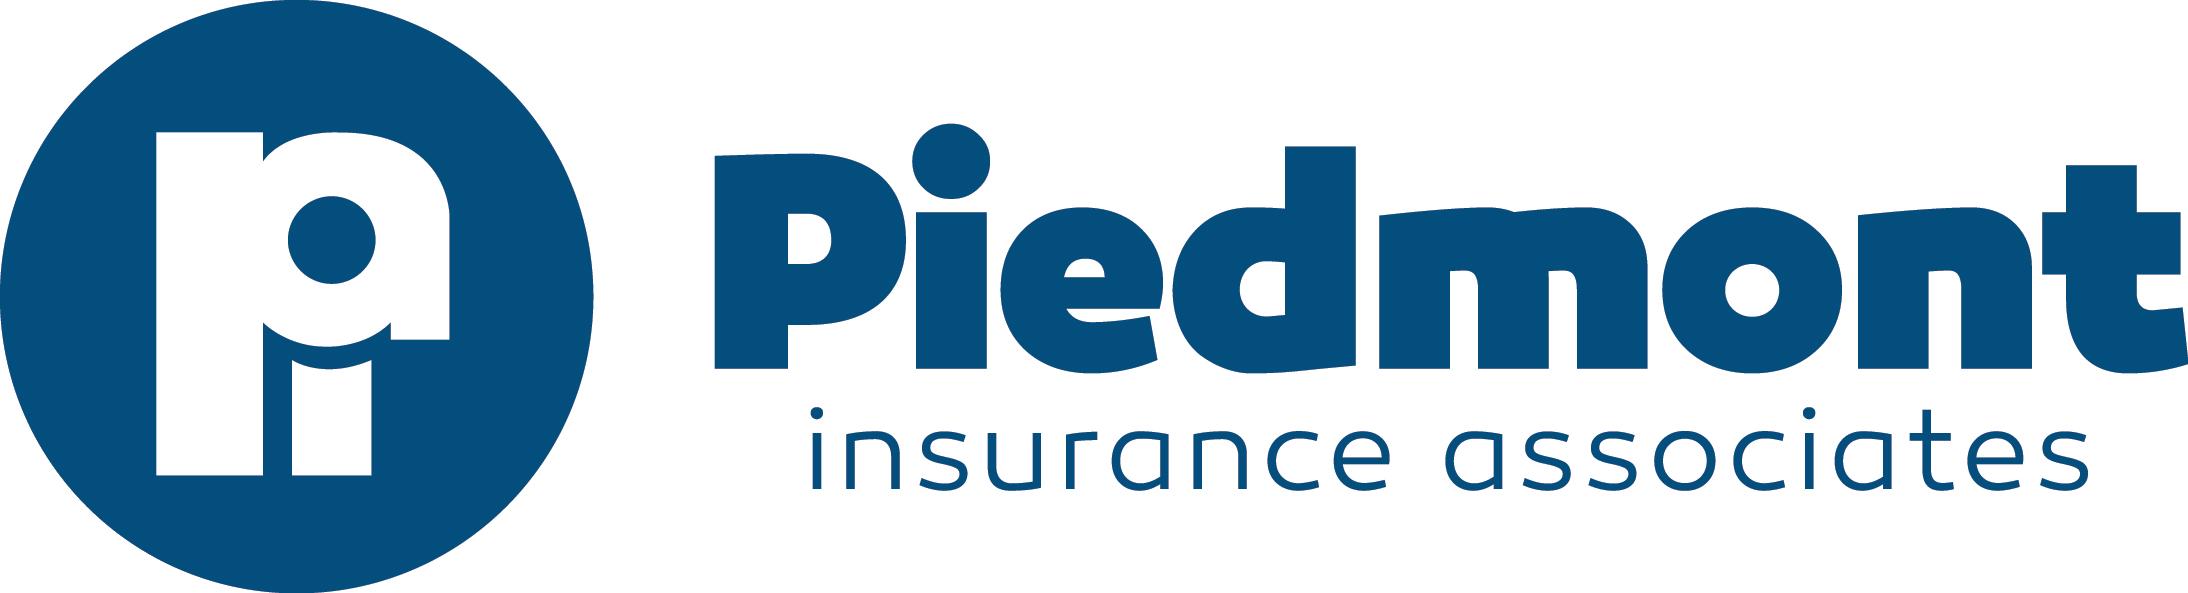 Piedmont Insurance Associates